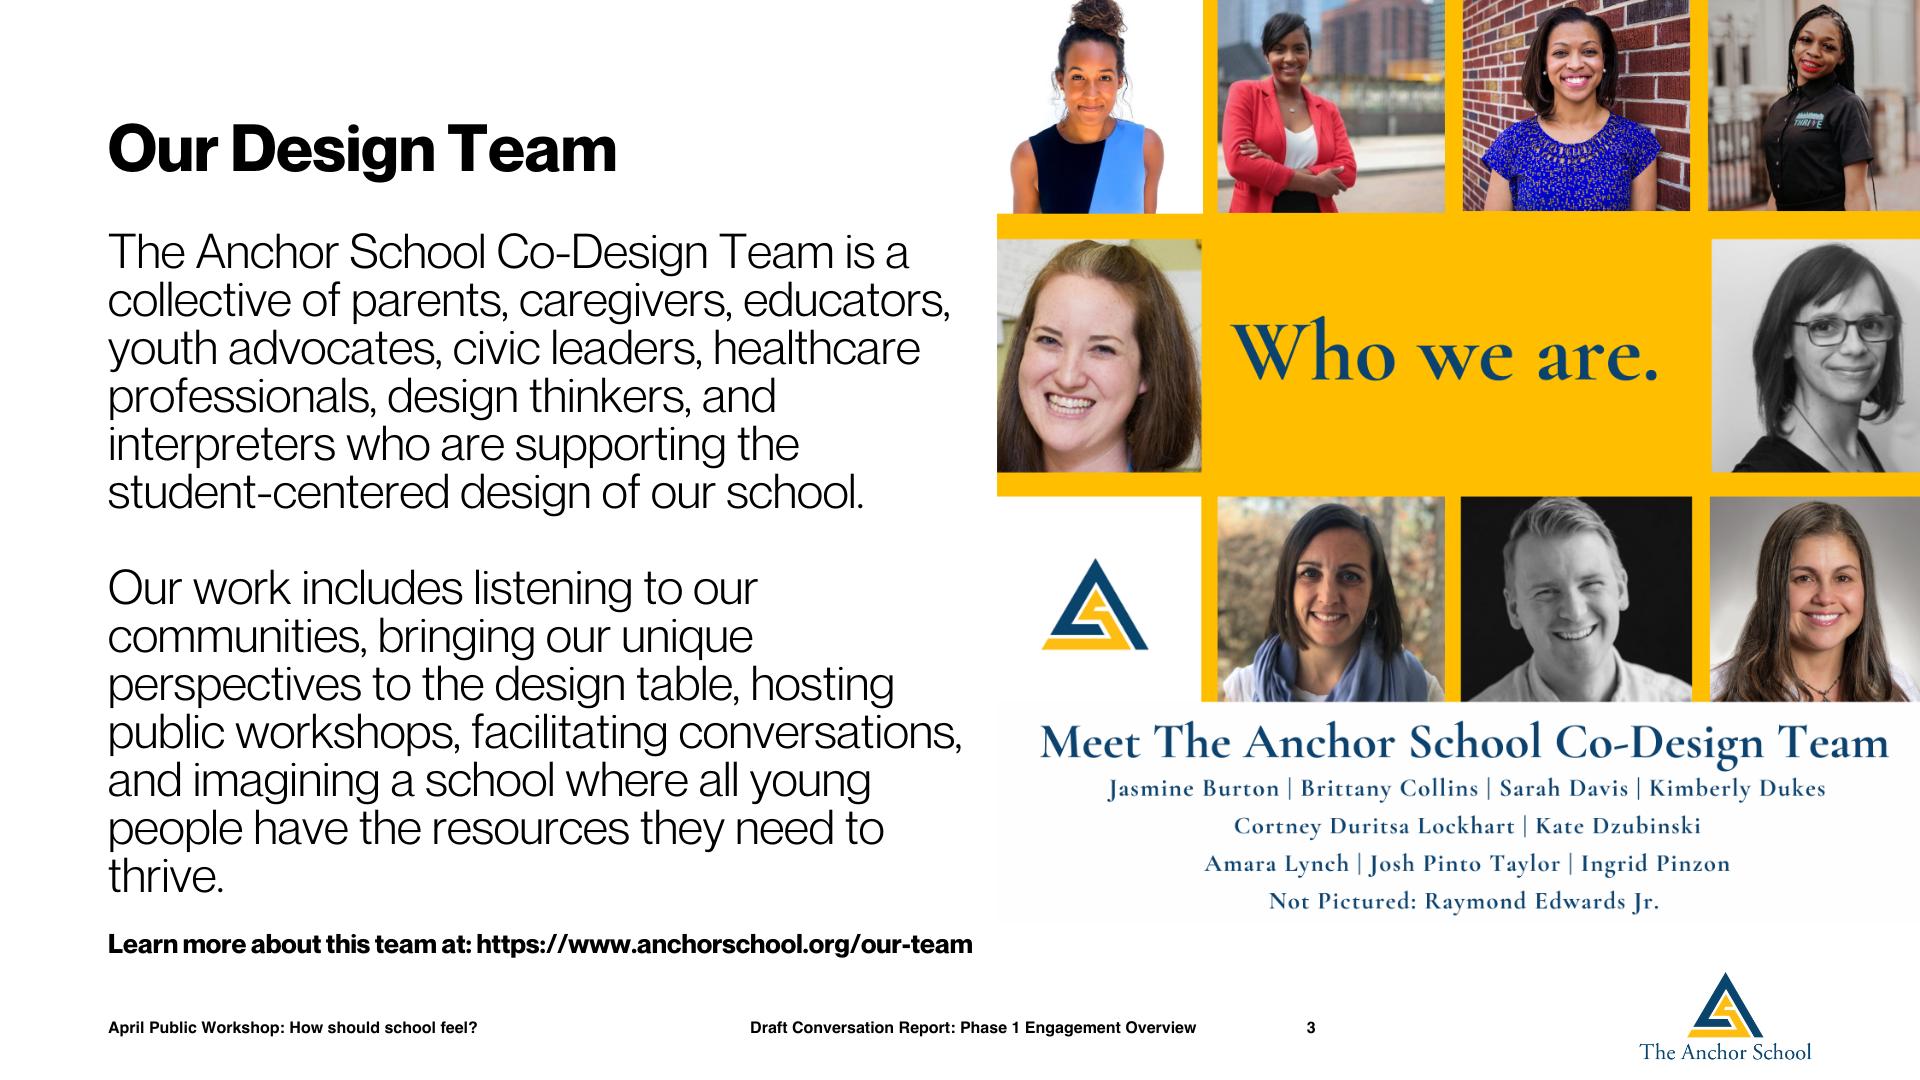 Public Workshop Series School Design The Anchor School (2)